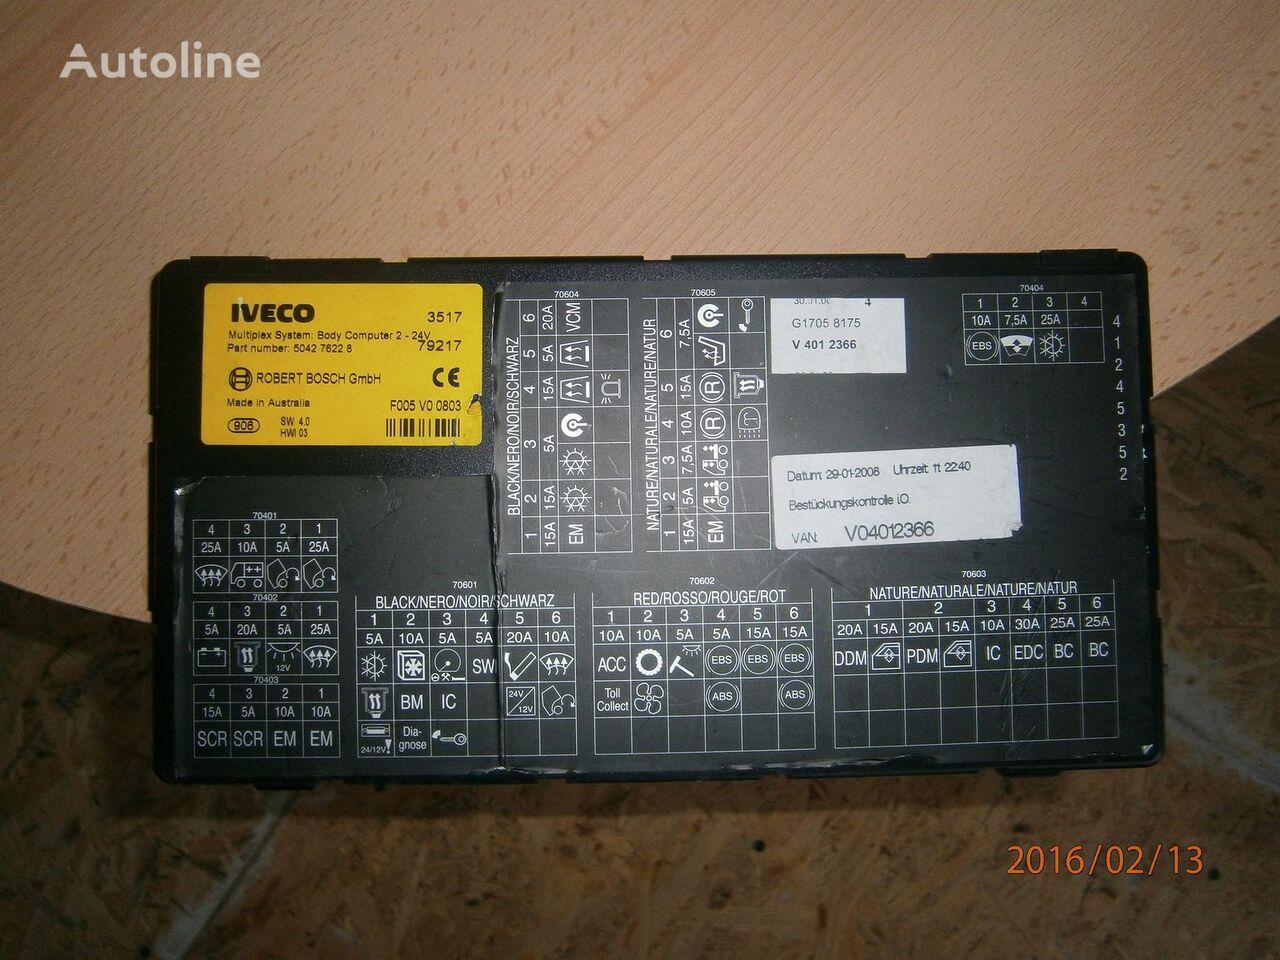 upravljačka jedinica  Iveco Stralis EURO5 Multiplex system body computer 504276228 za tegljača IVECO Stralis